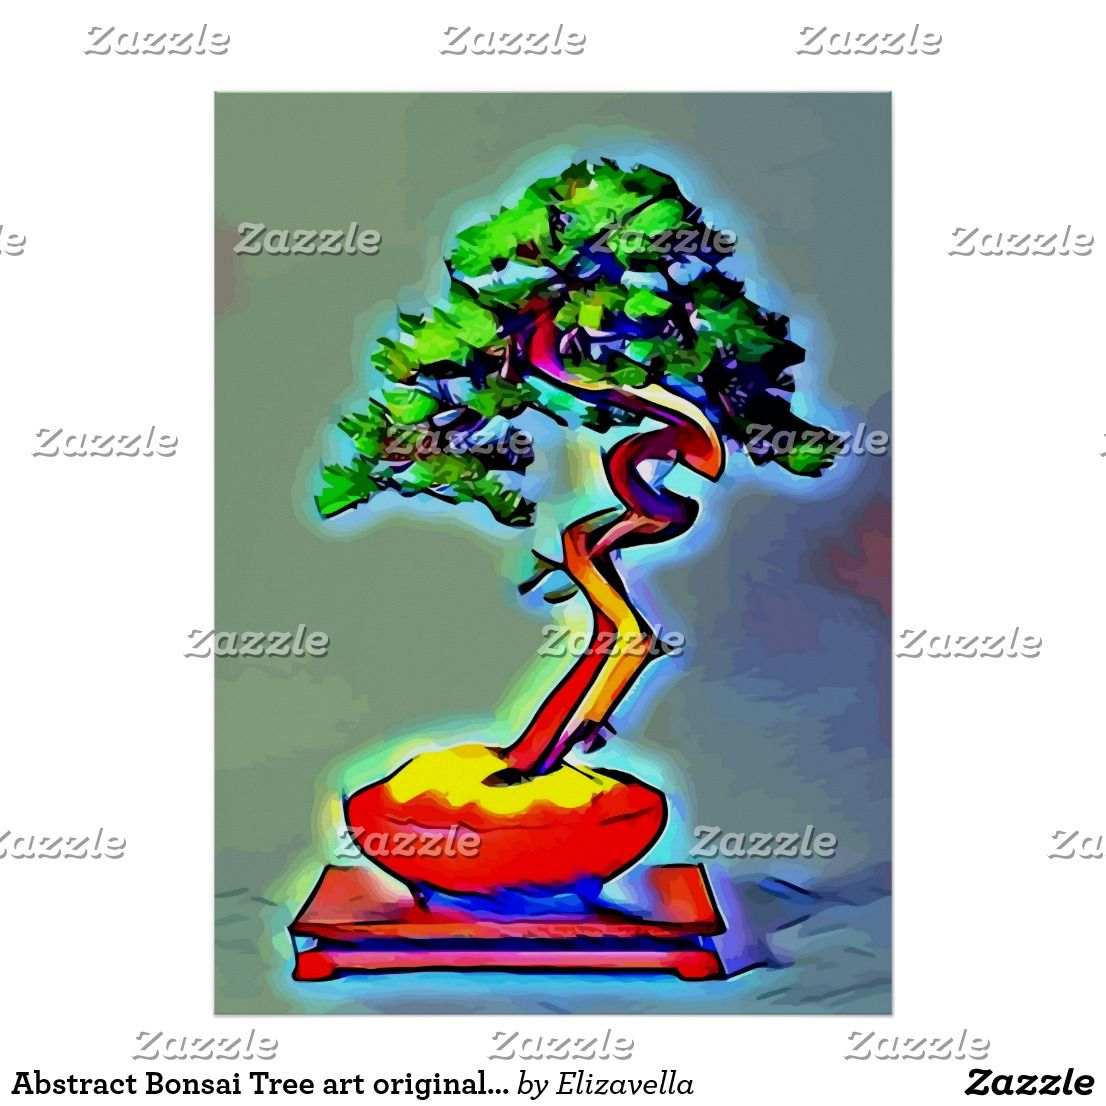 Abstract Bonsai Tree art original nature pop trees Poster